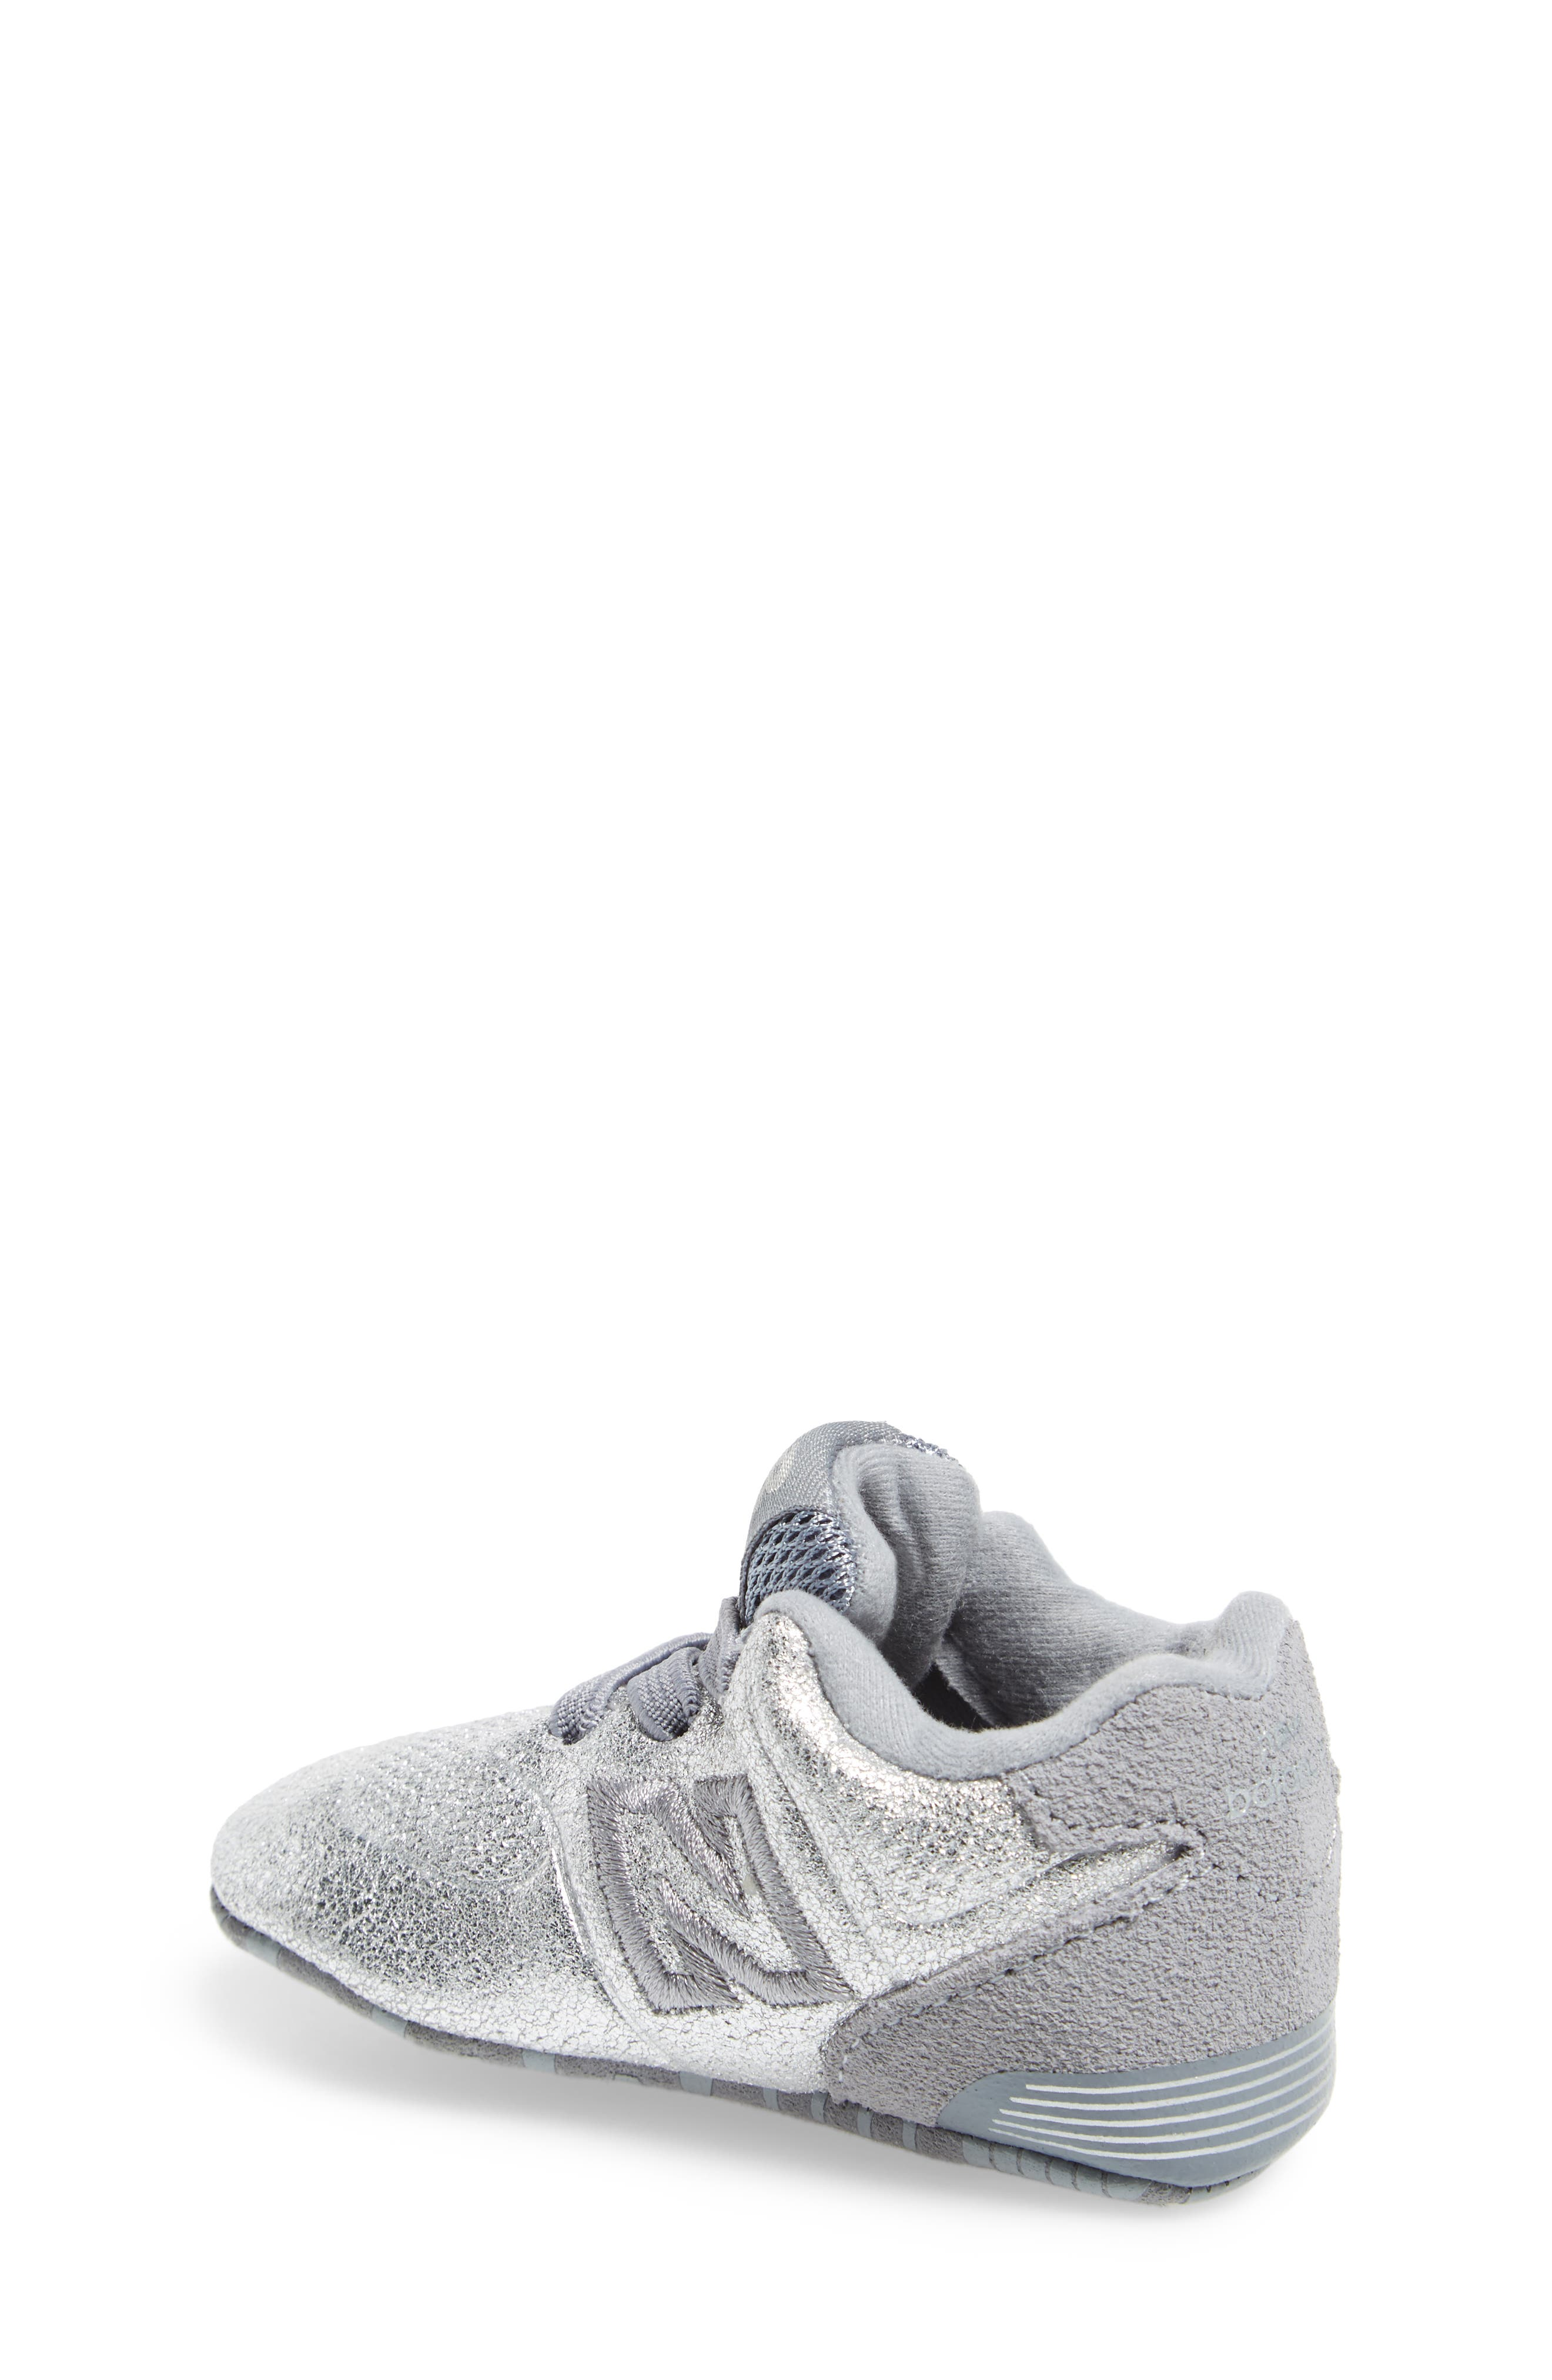 574 Metallic Crib Sneaker,                             Alternate thumbnail 2, color,                             040